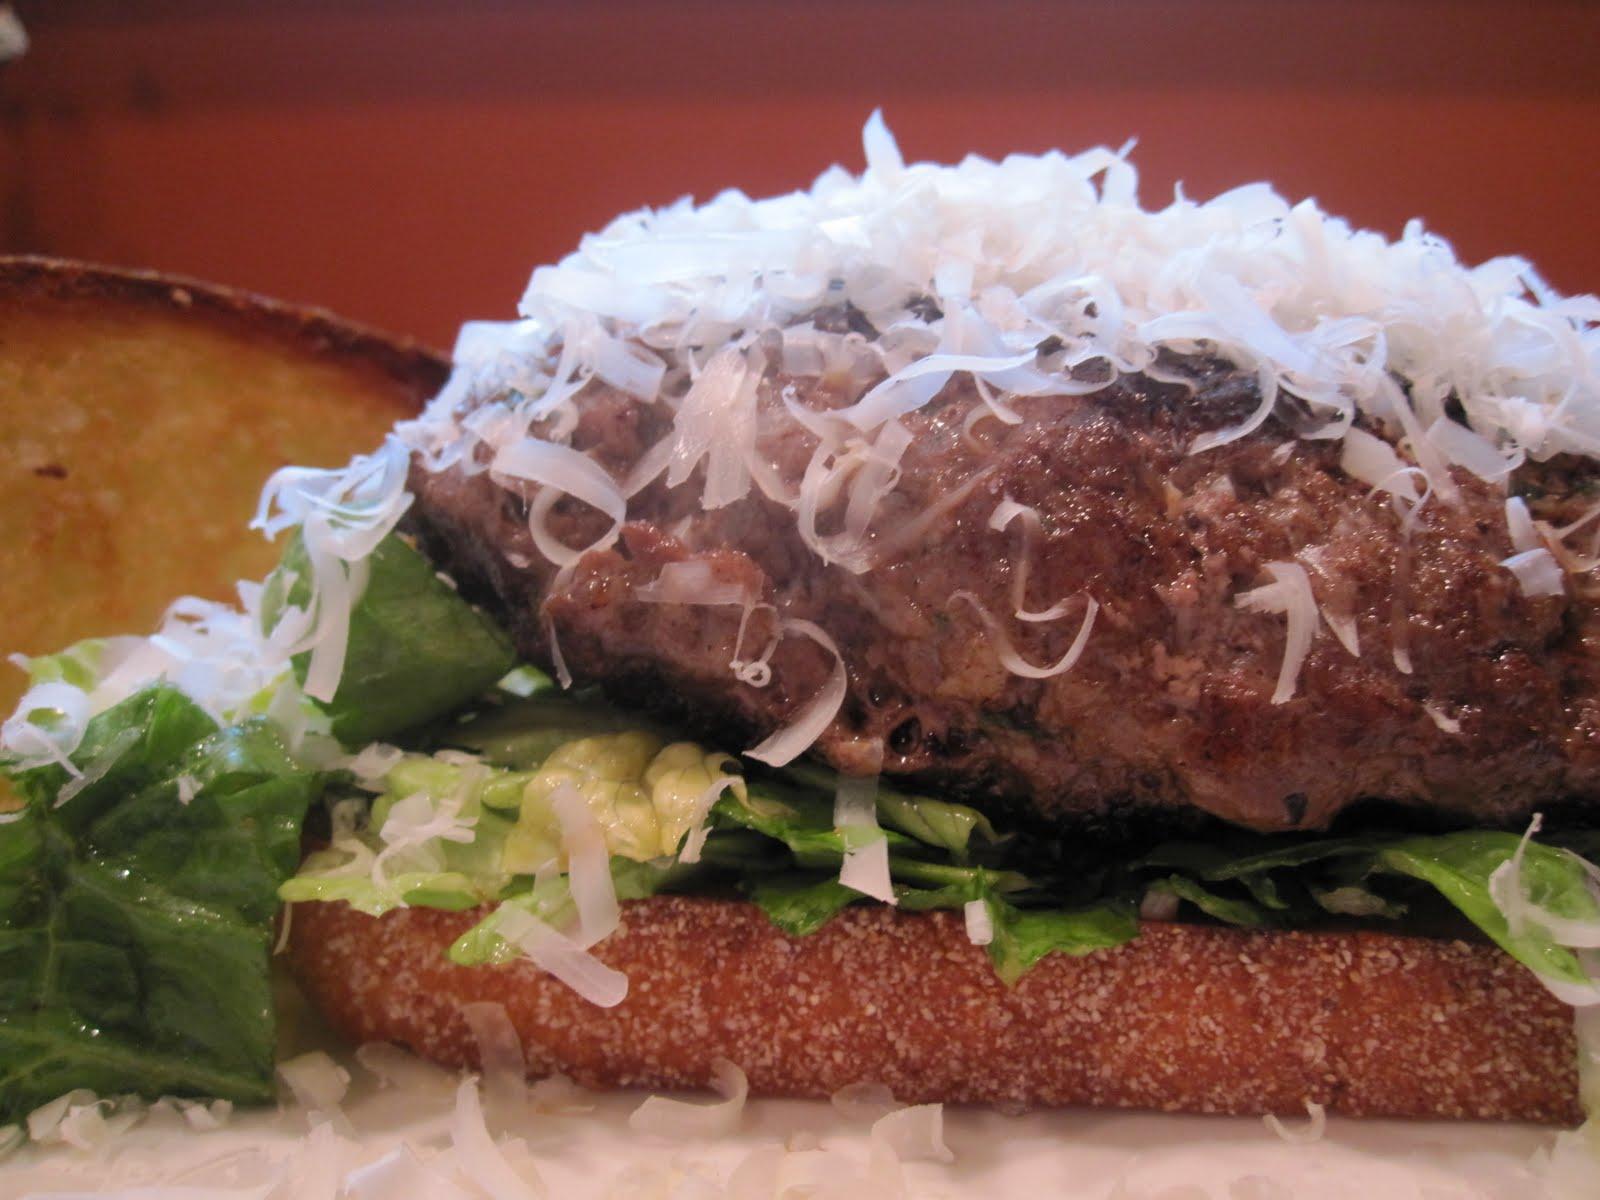 ... Burger Club: Caesar Salad and Flank Steak Burgers with Garlic Crostini